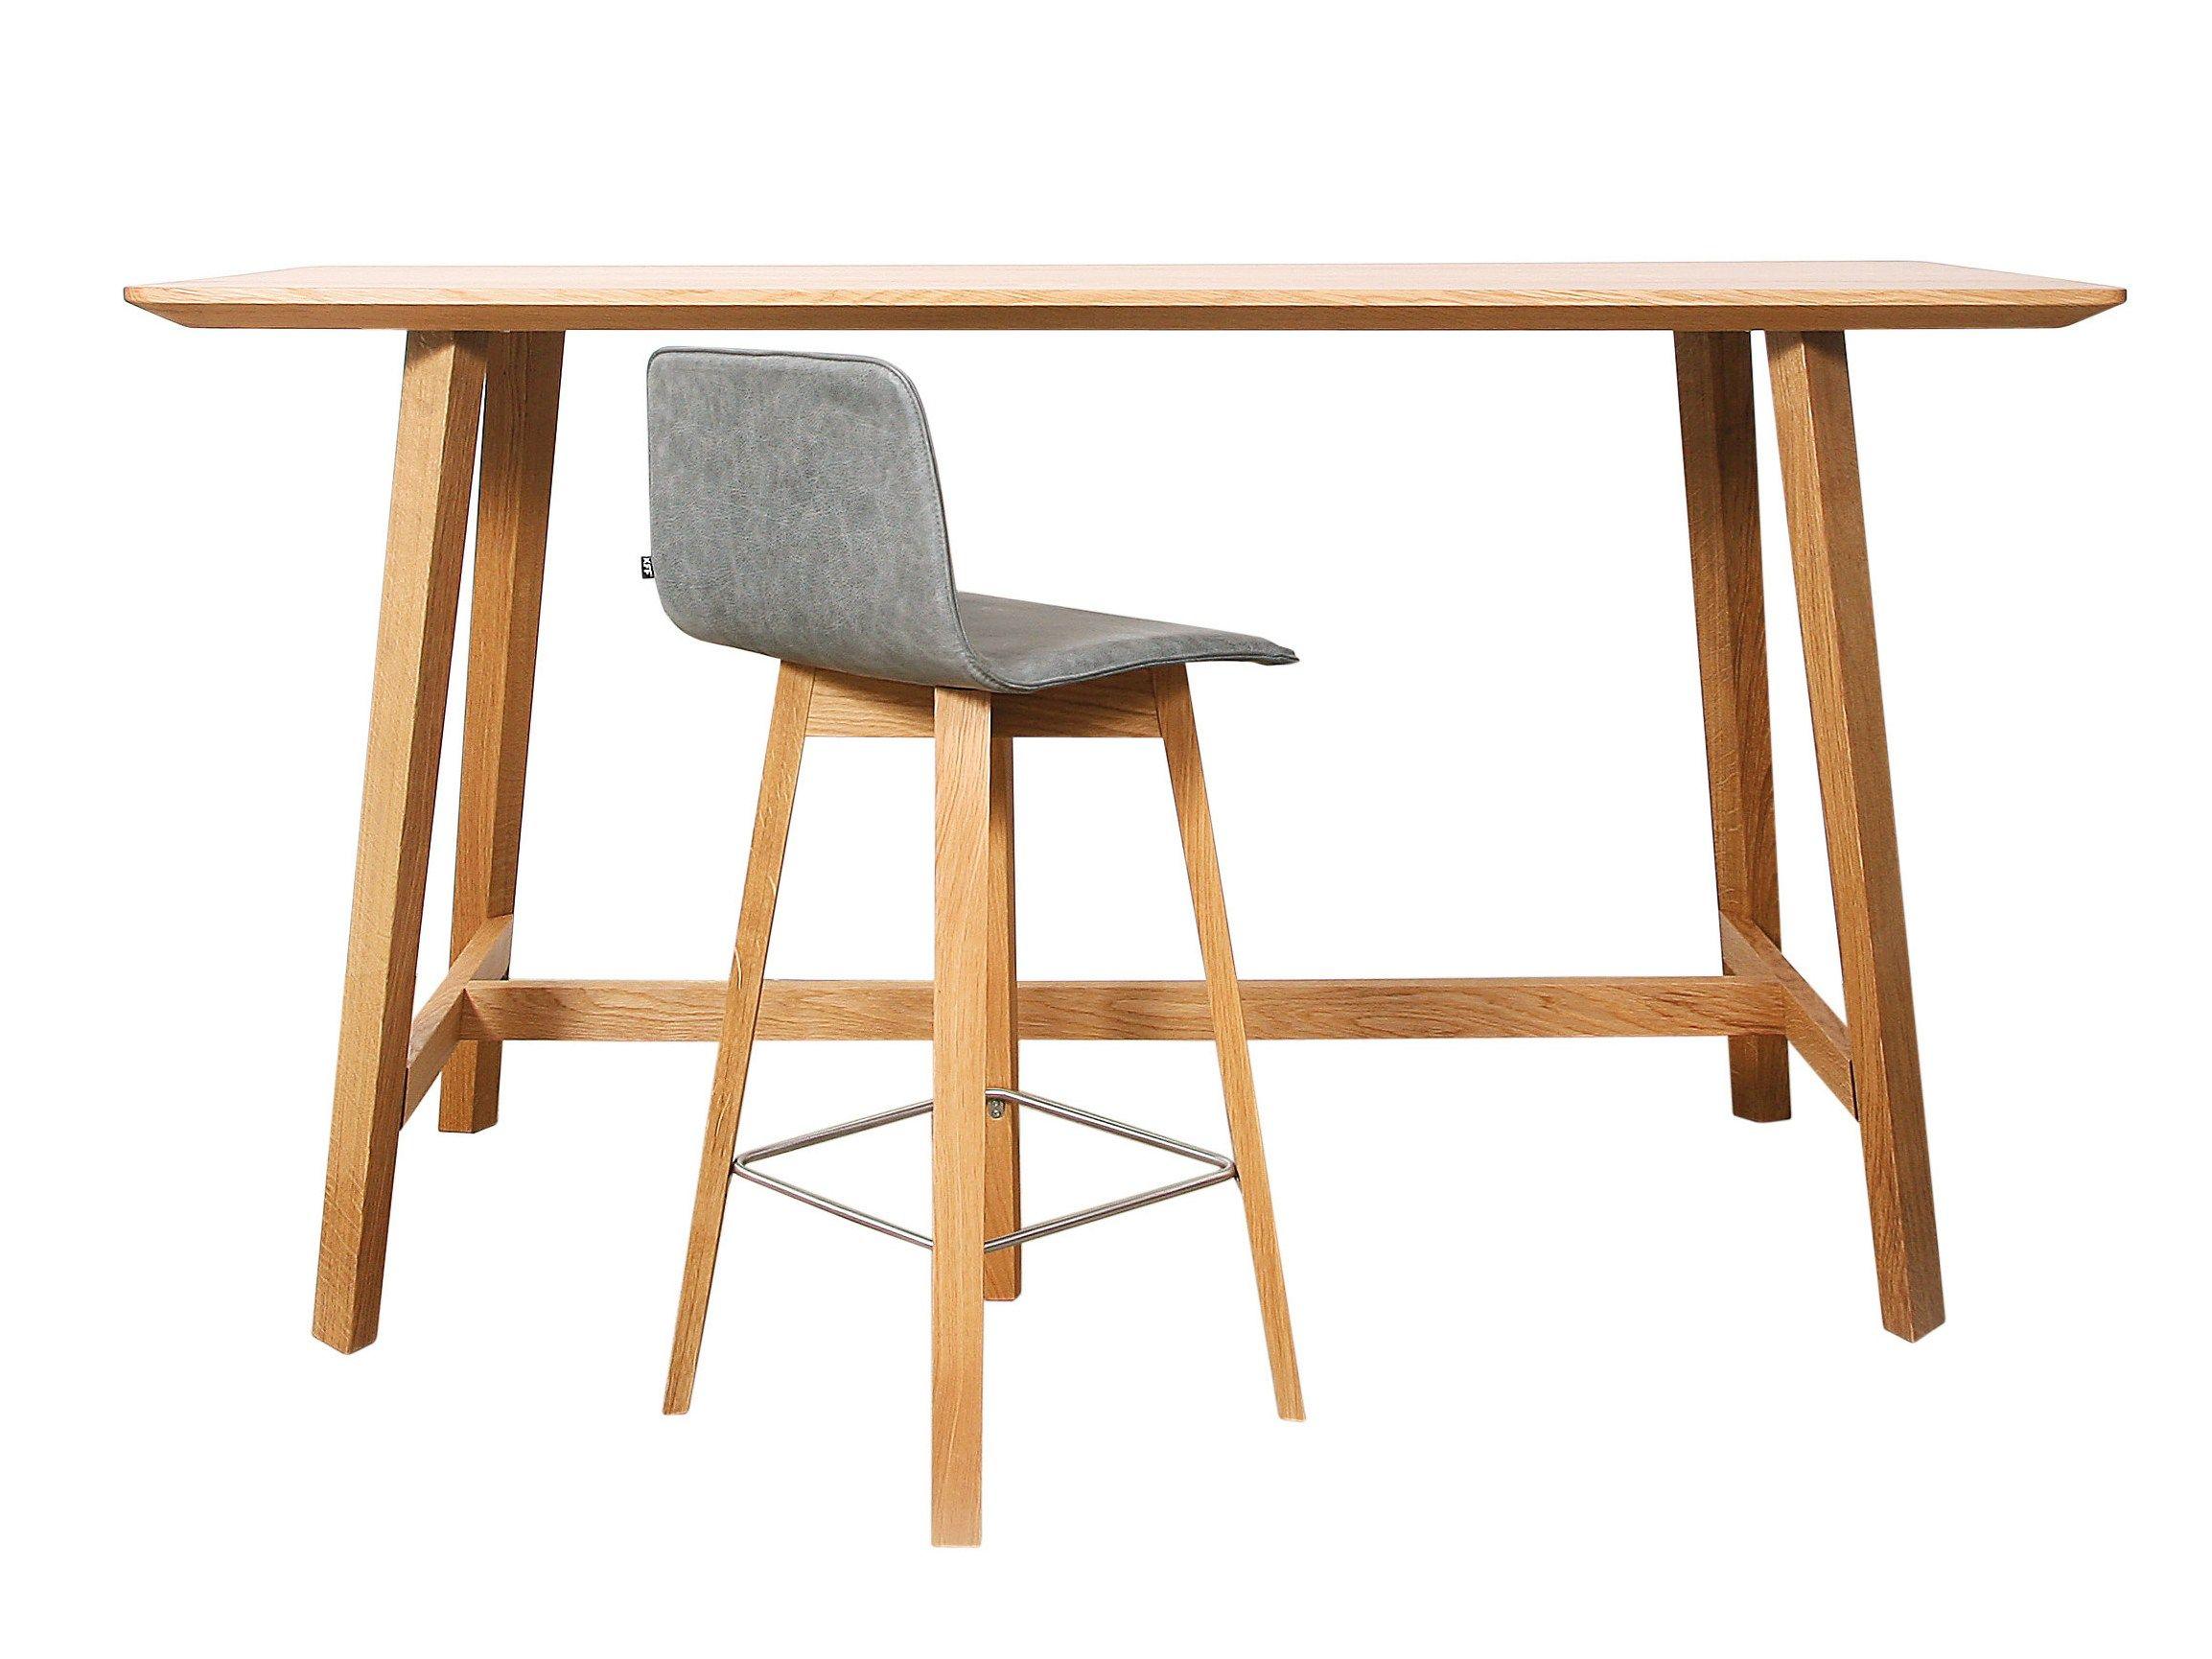 Maverick mange debout by kff design birgit hoffmann - Longue table en bois ...